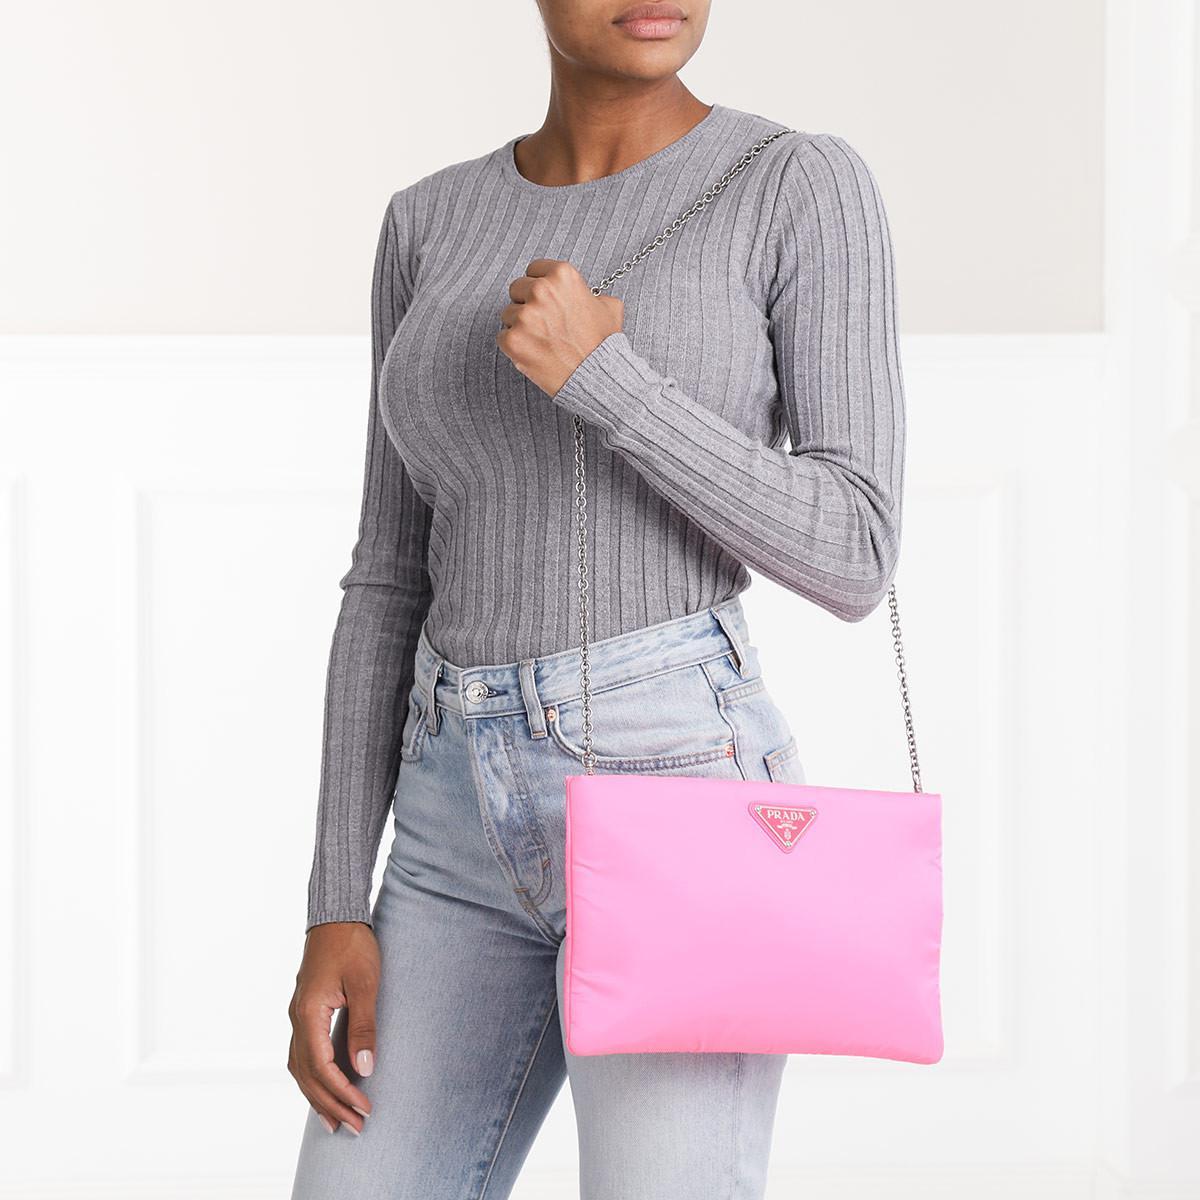 3168f0991d2fc9 Prada - Padded Nylon Clutch Medium Neon Pink - Lyst. View fullscreen